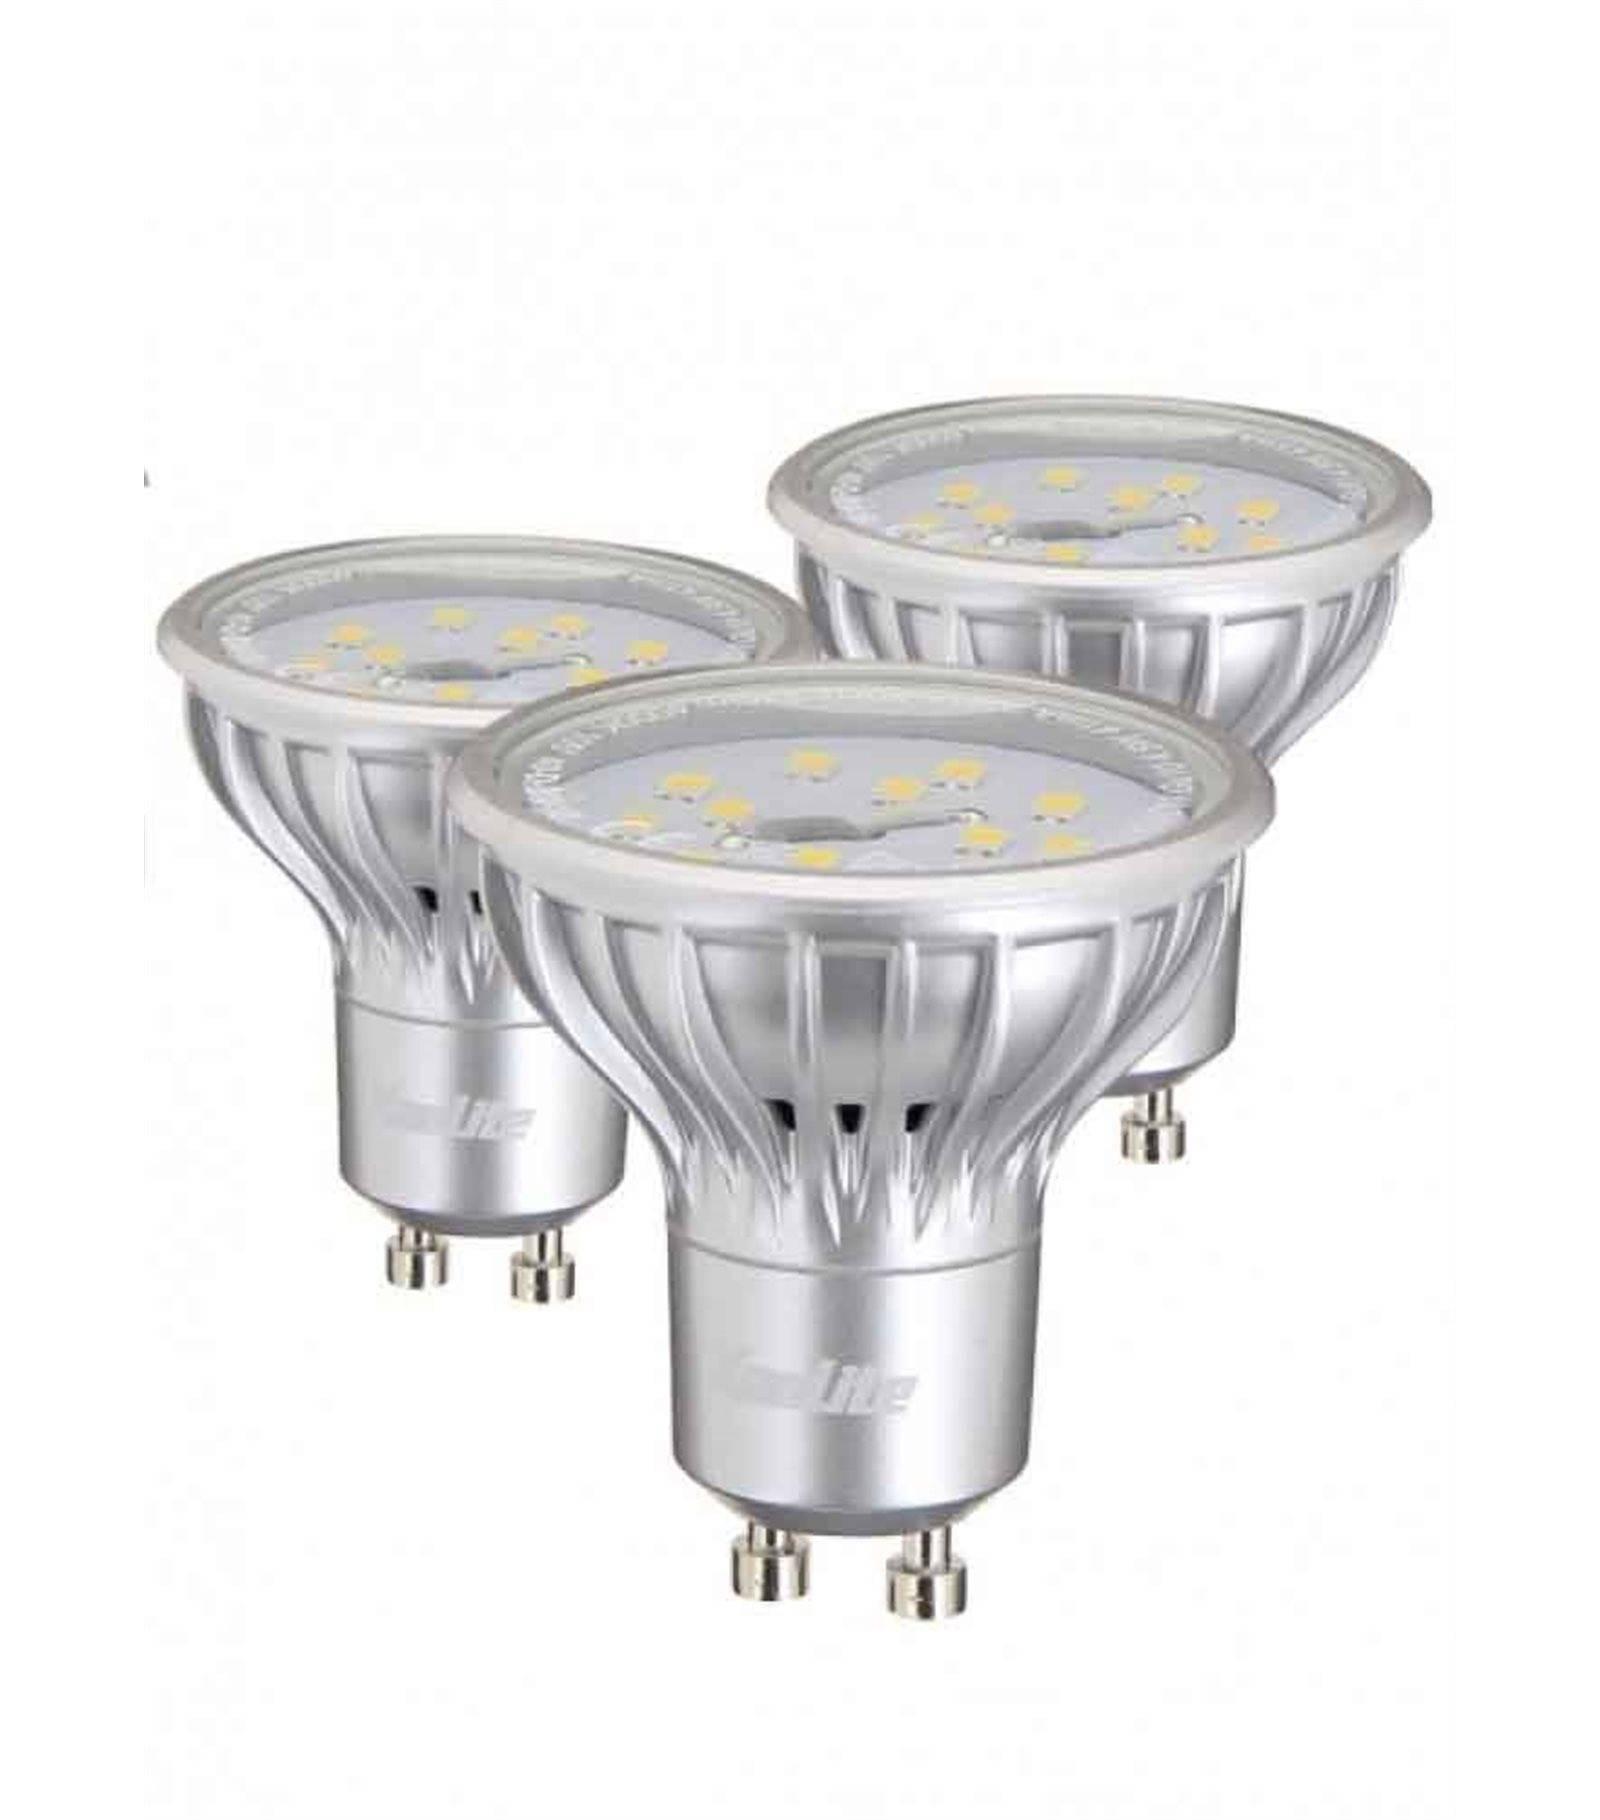 lot de 3 ampoule led gu10 smd 2 3w 130lm quiv 25w blanc chaud 110 xanlite gu10 siageo. Black Bedroom Furniture Sets. Home Design Ideas